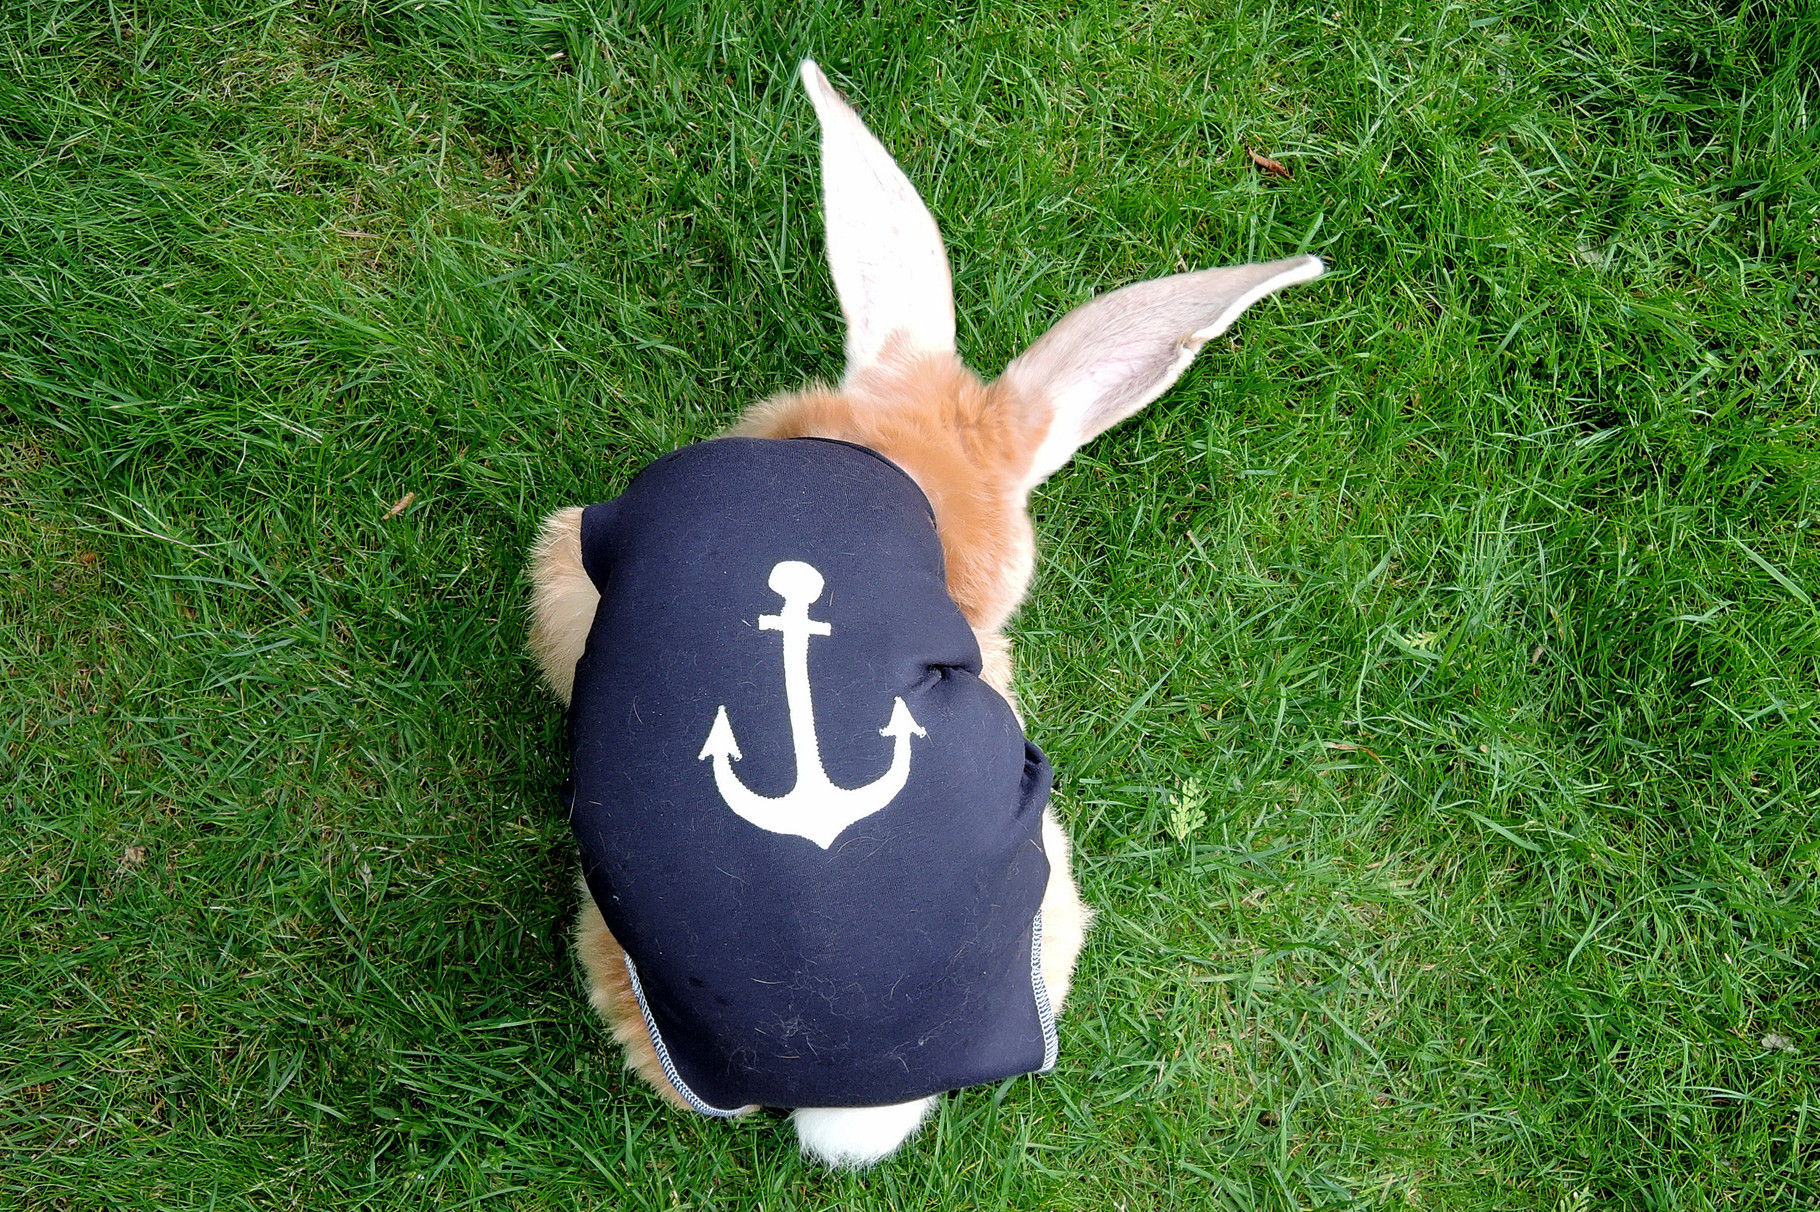 ***bunnywear-exclusiv*** Design, Modell: Finchen